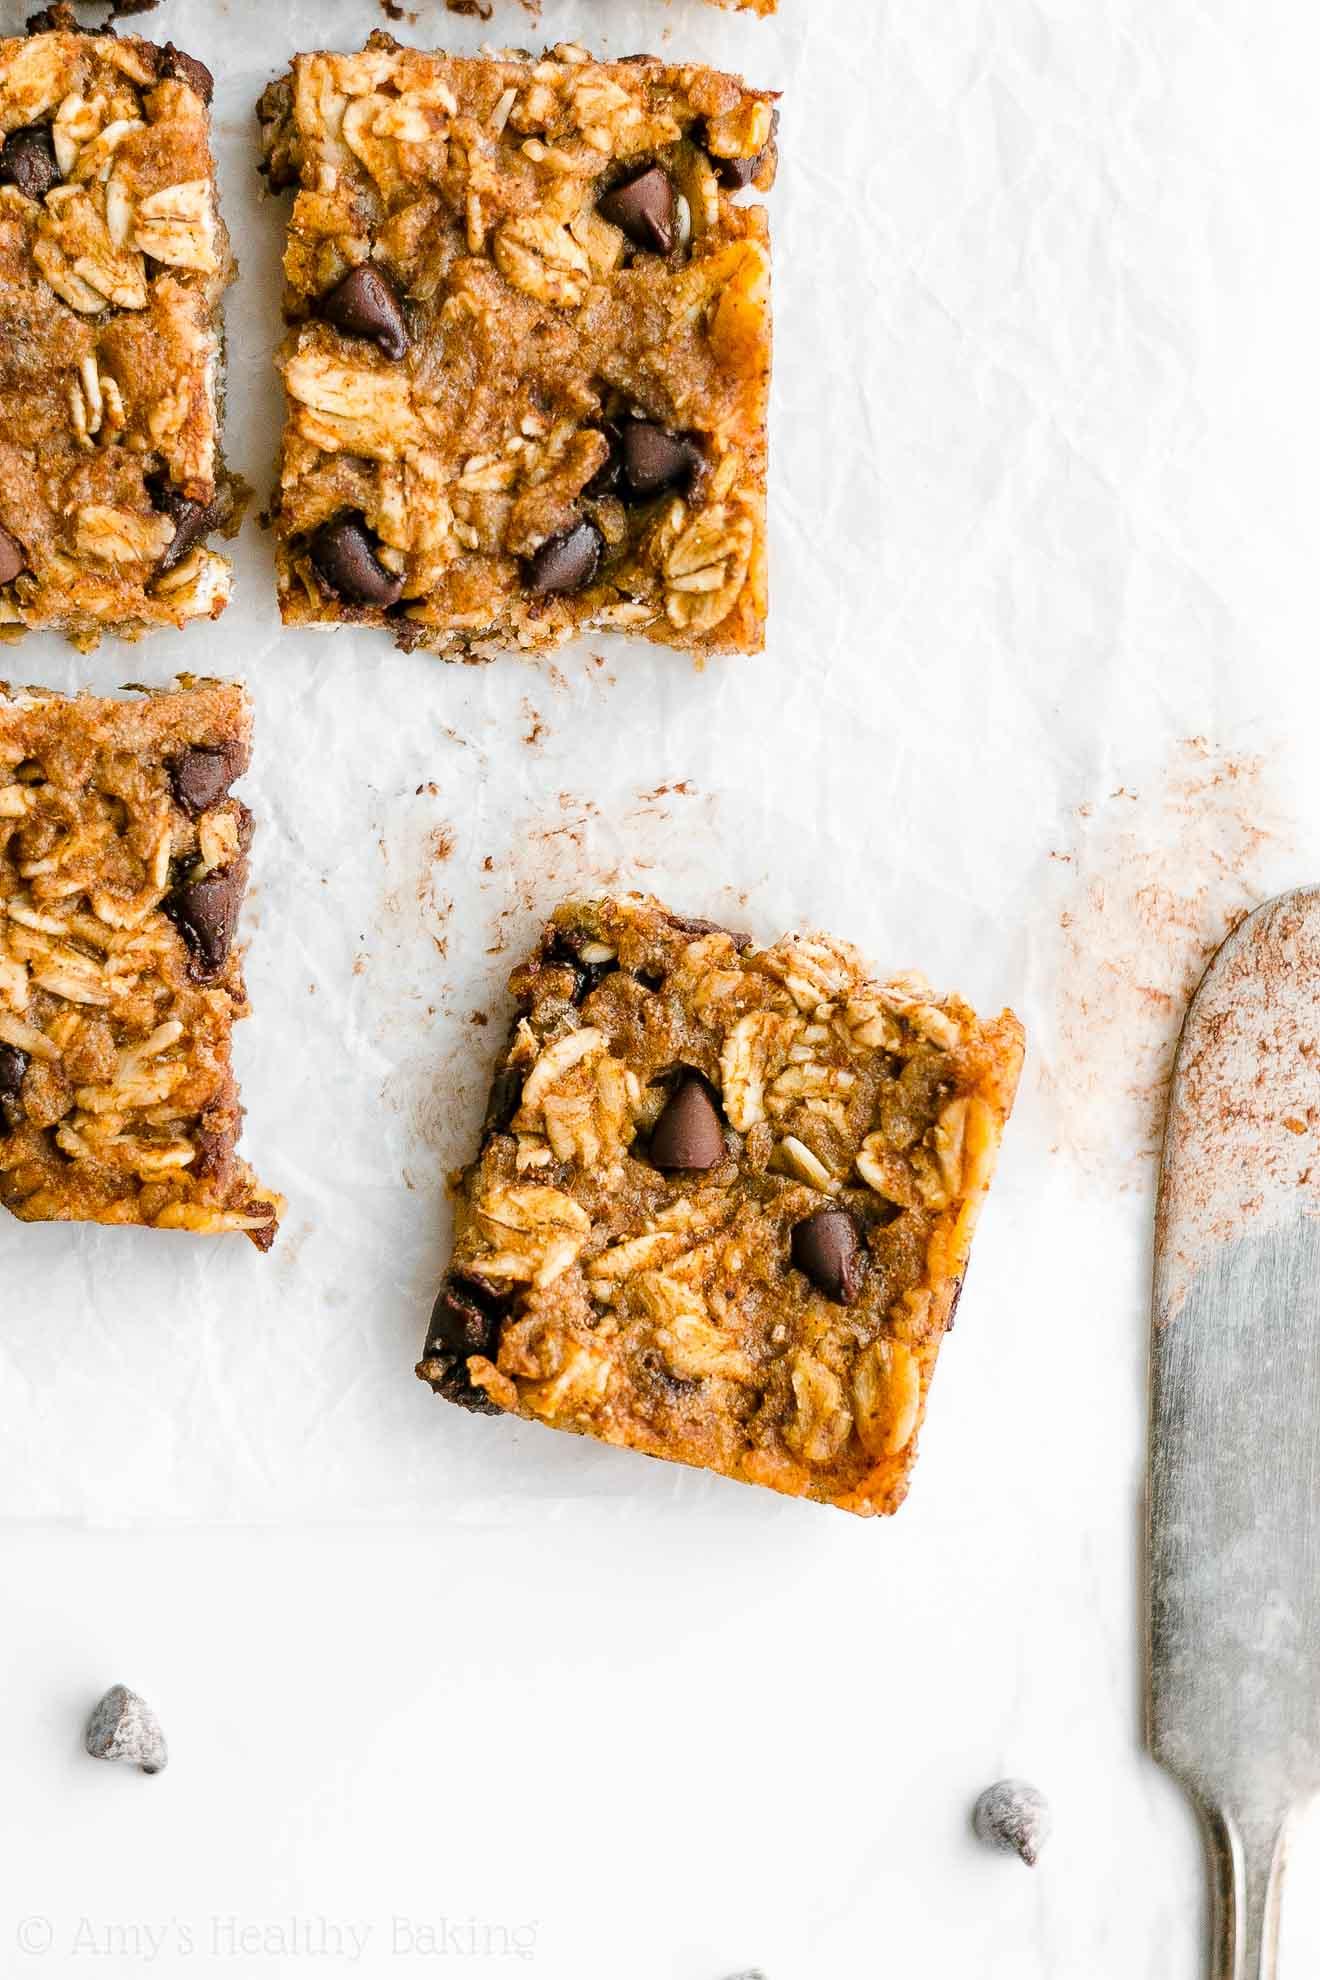 Easy Healthy Gluten Free Chewy Pumpkin Chocolate Chip Granola Bar Bites